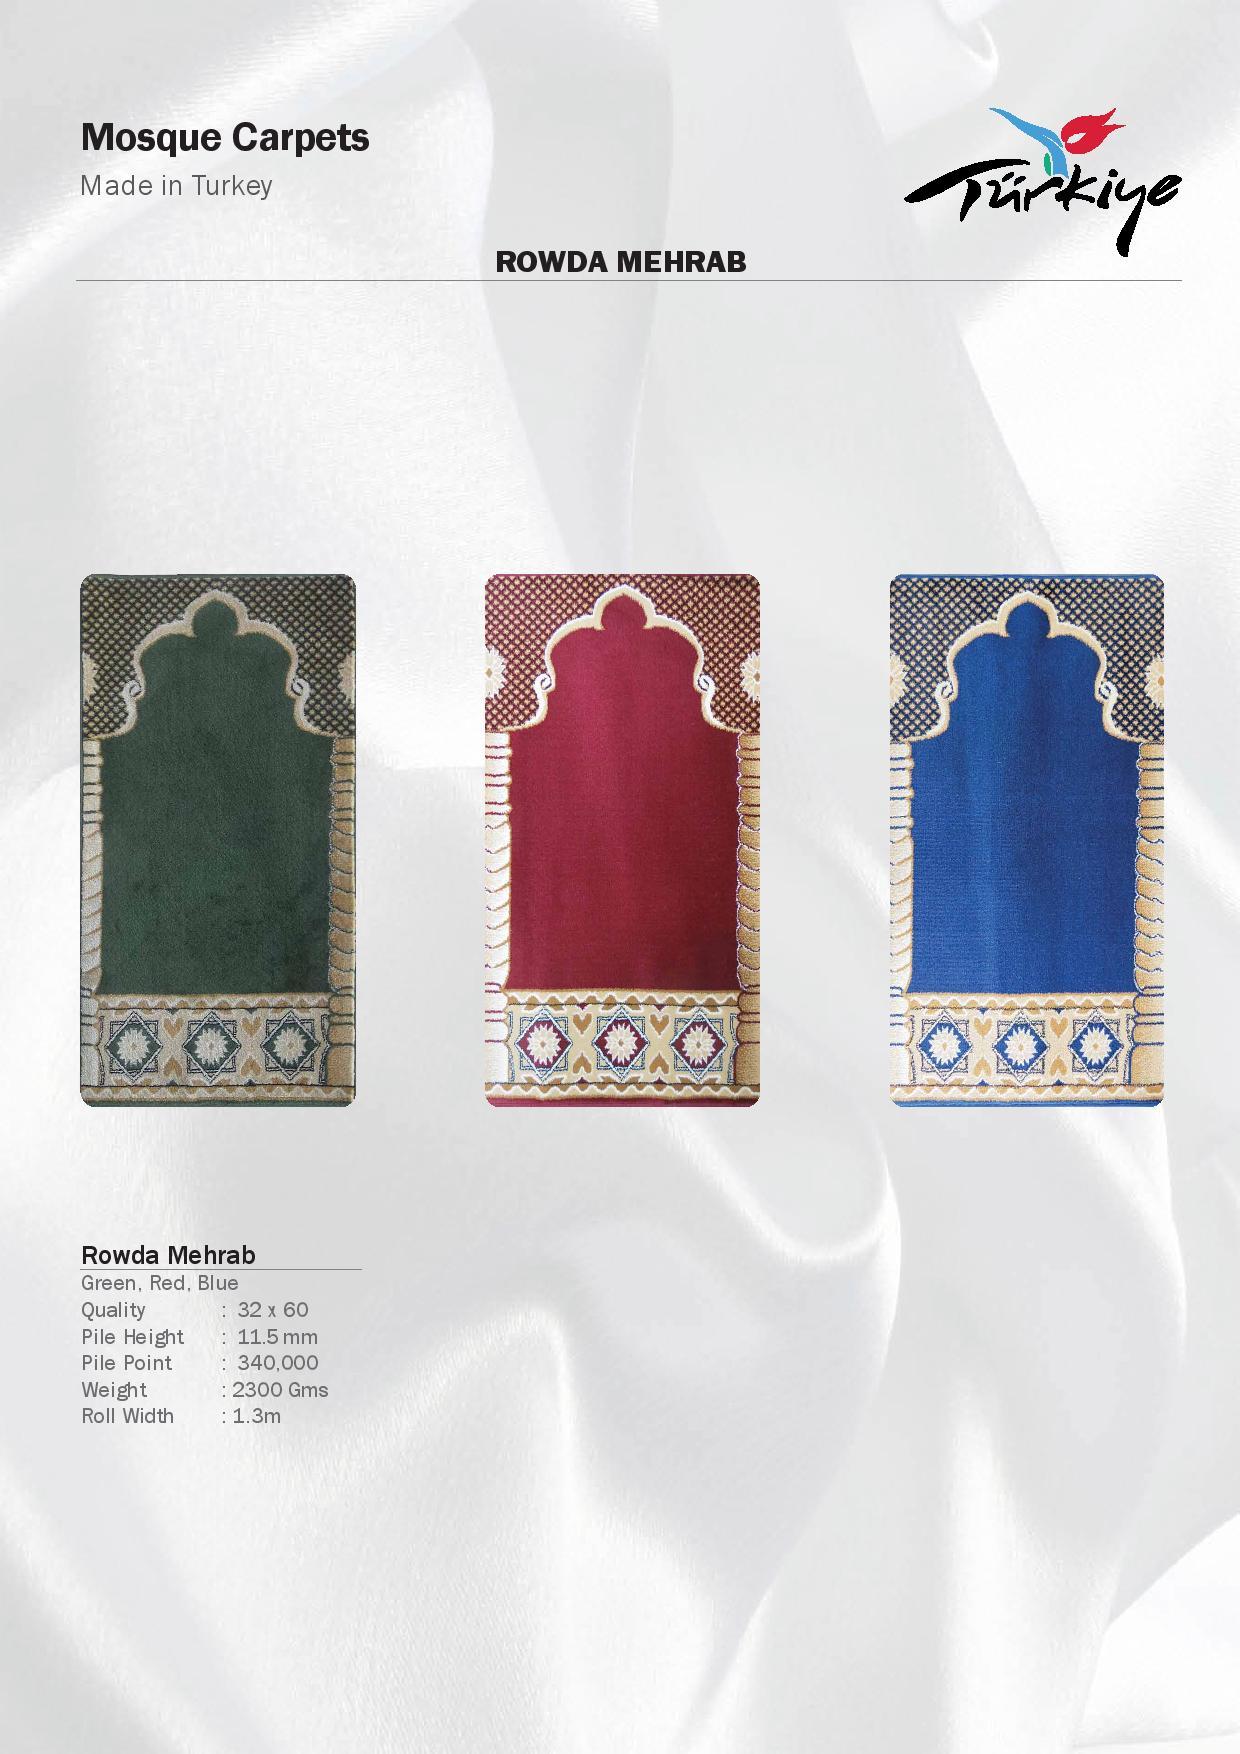 Mosque-Carpets-Rowda Mehrab